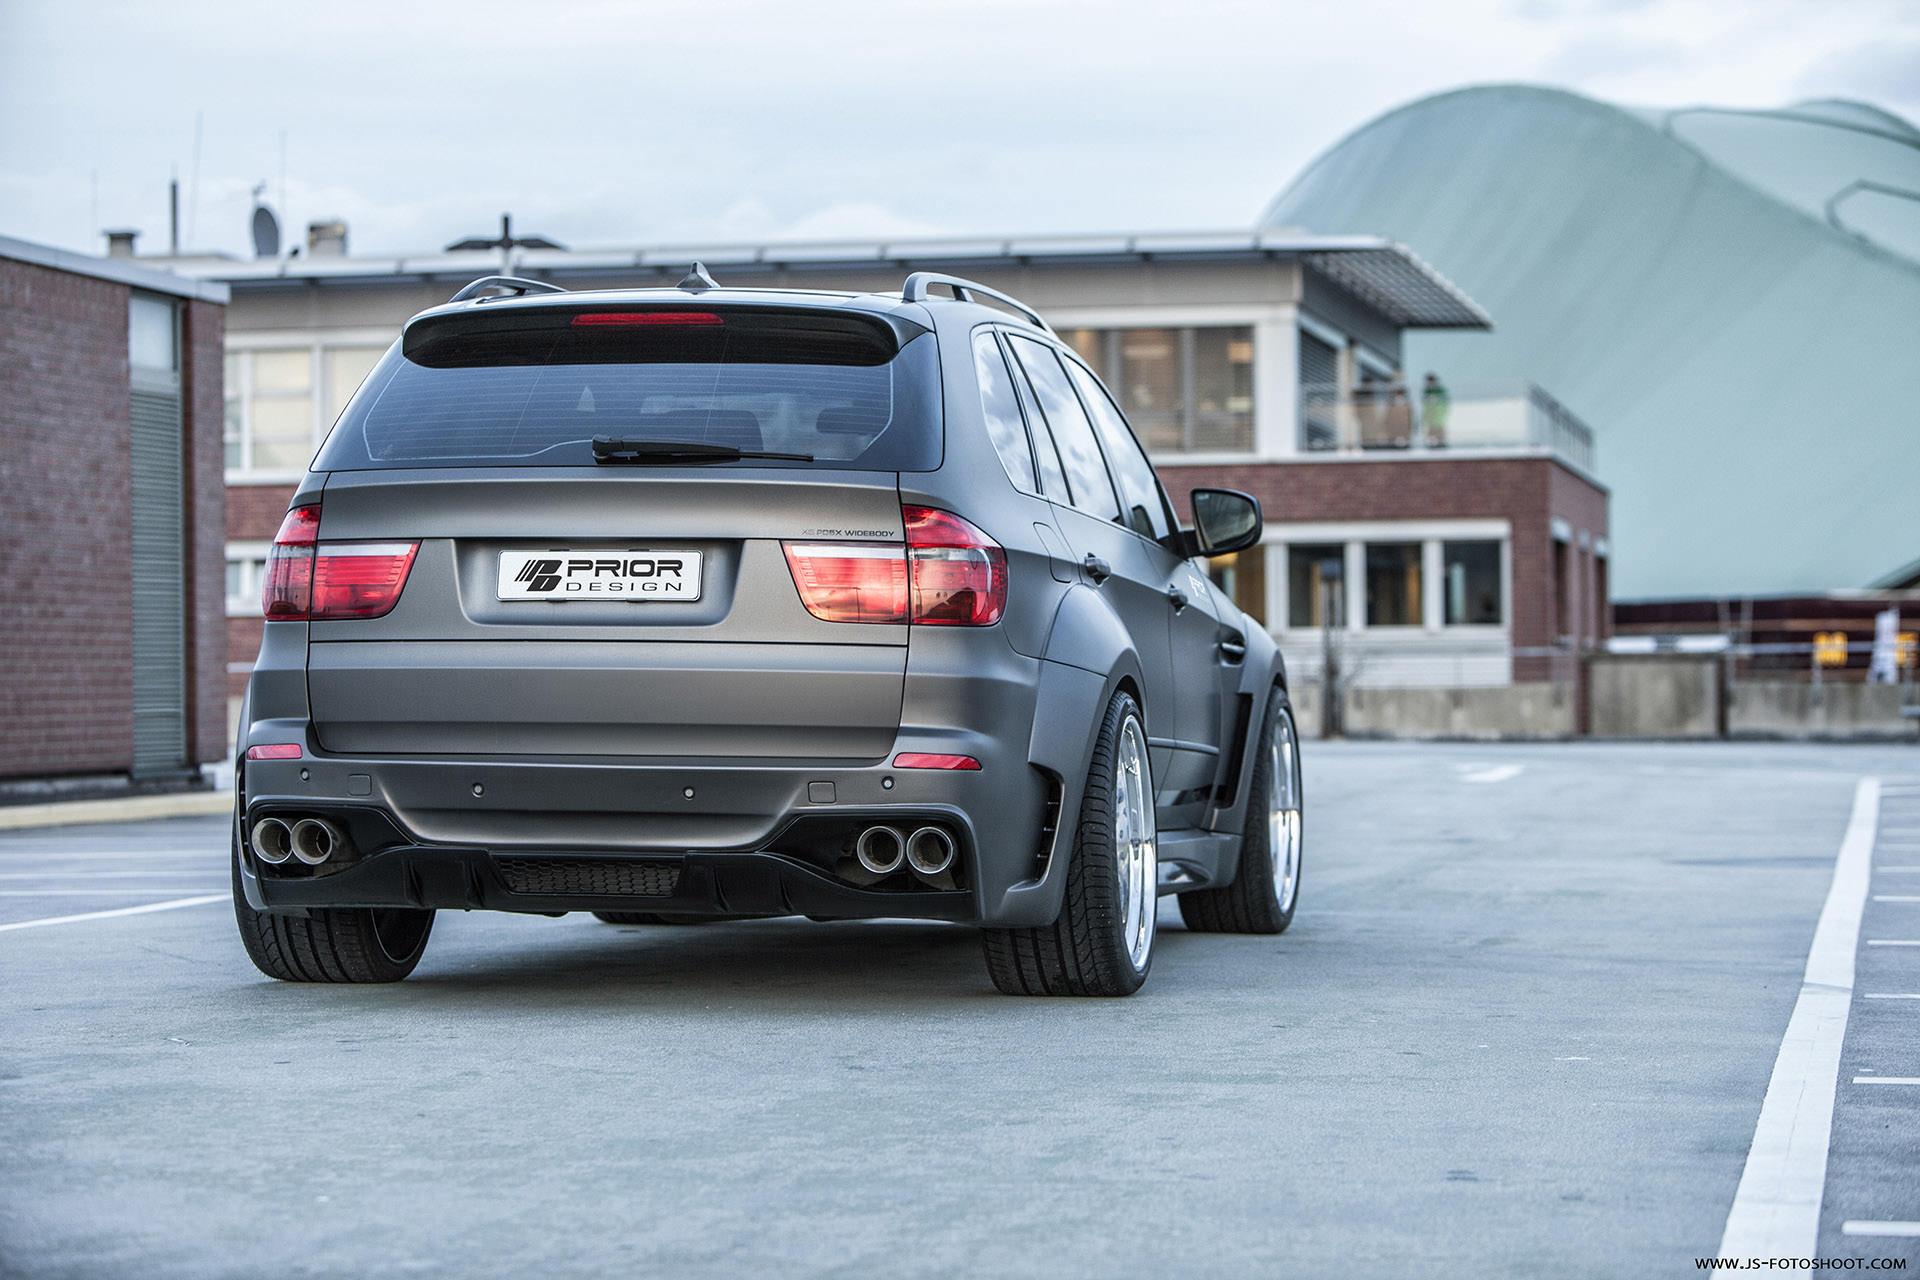 , BMW X5 / X5M, Pitlane Tuning Shop